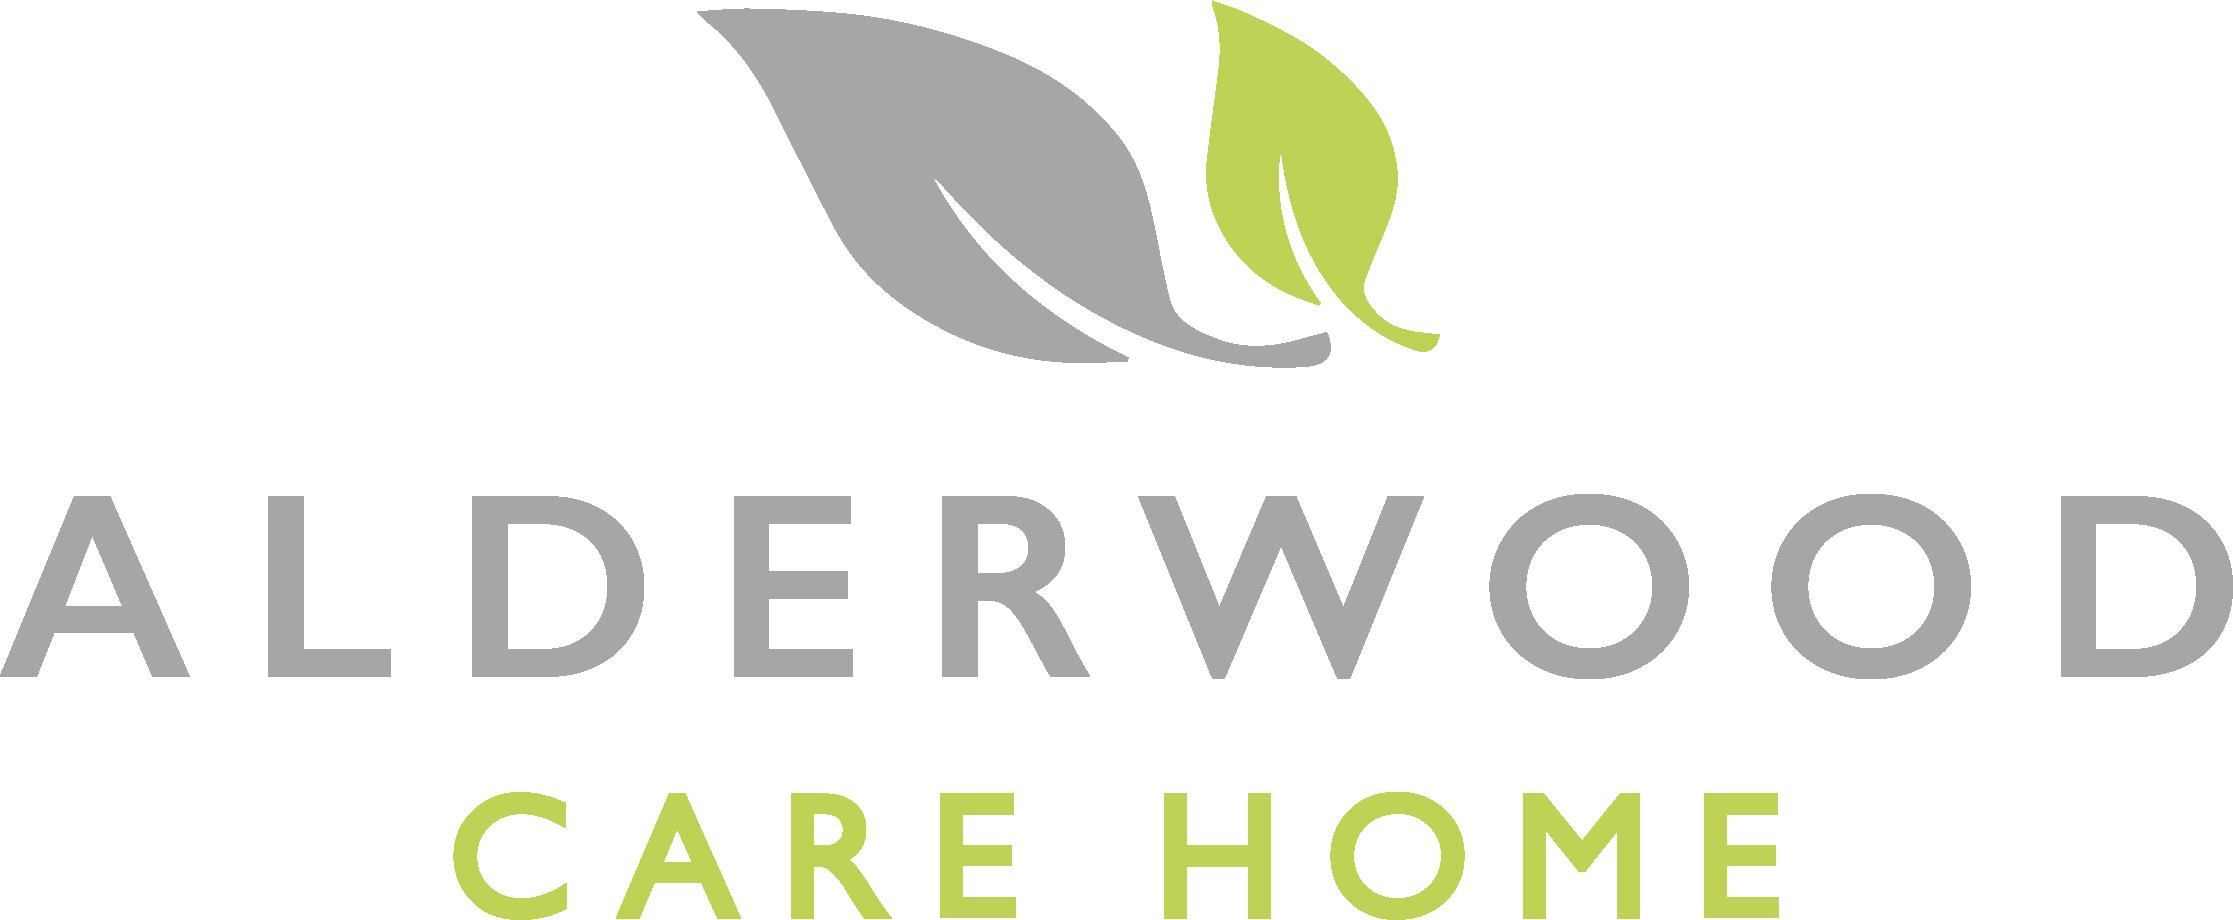 Alderwood Care Home